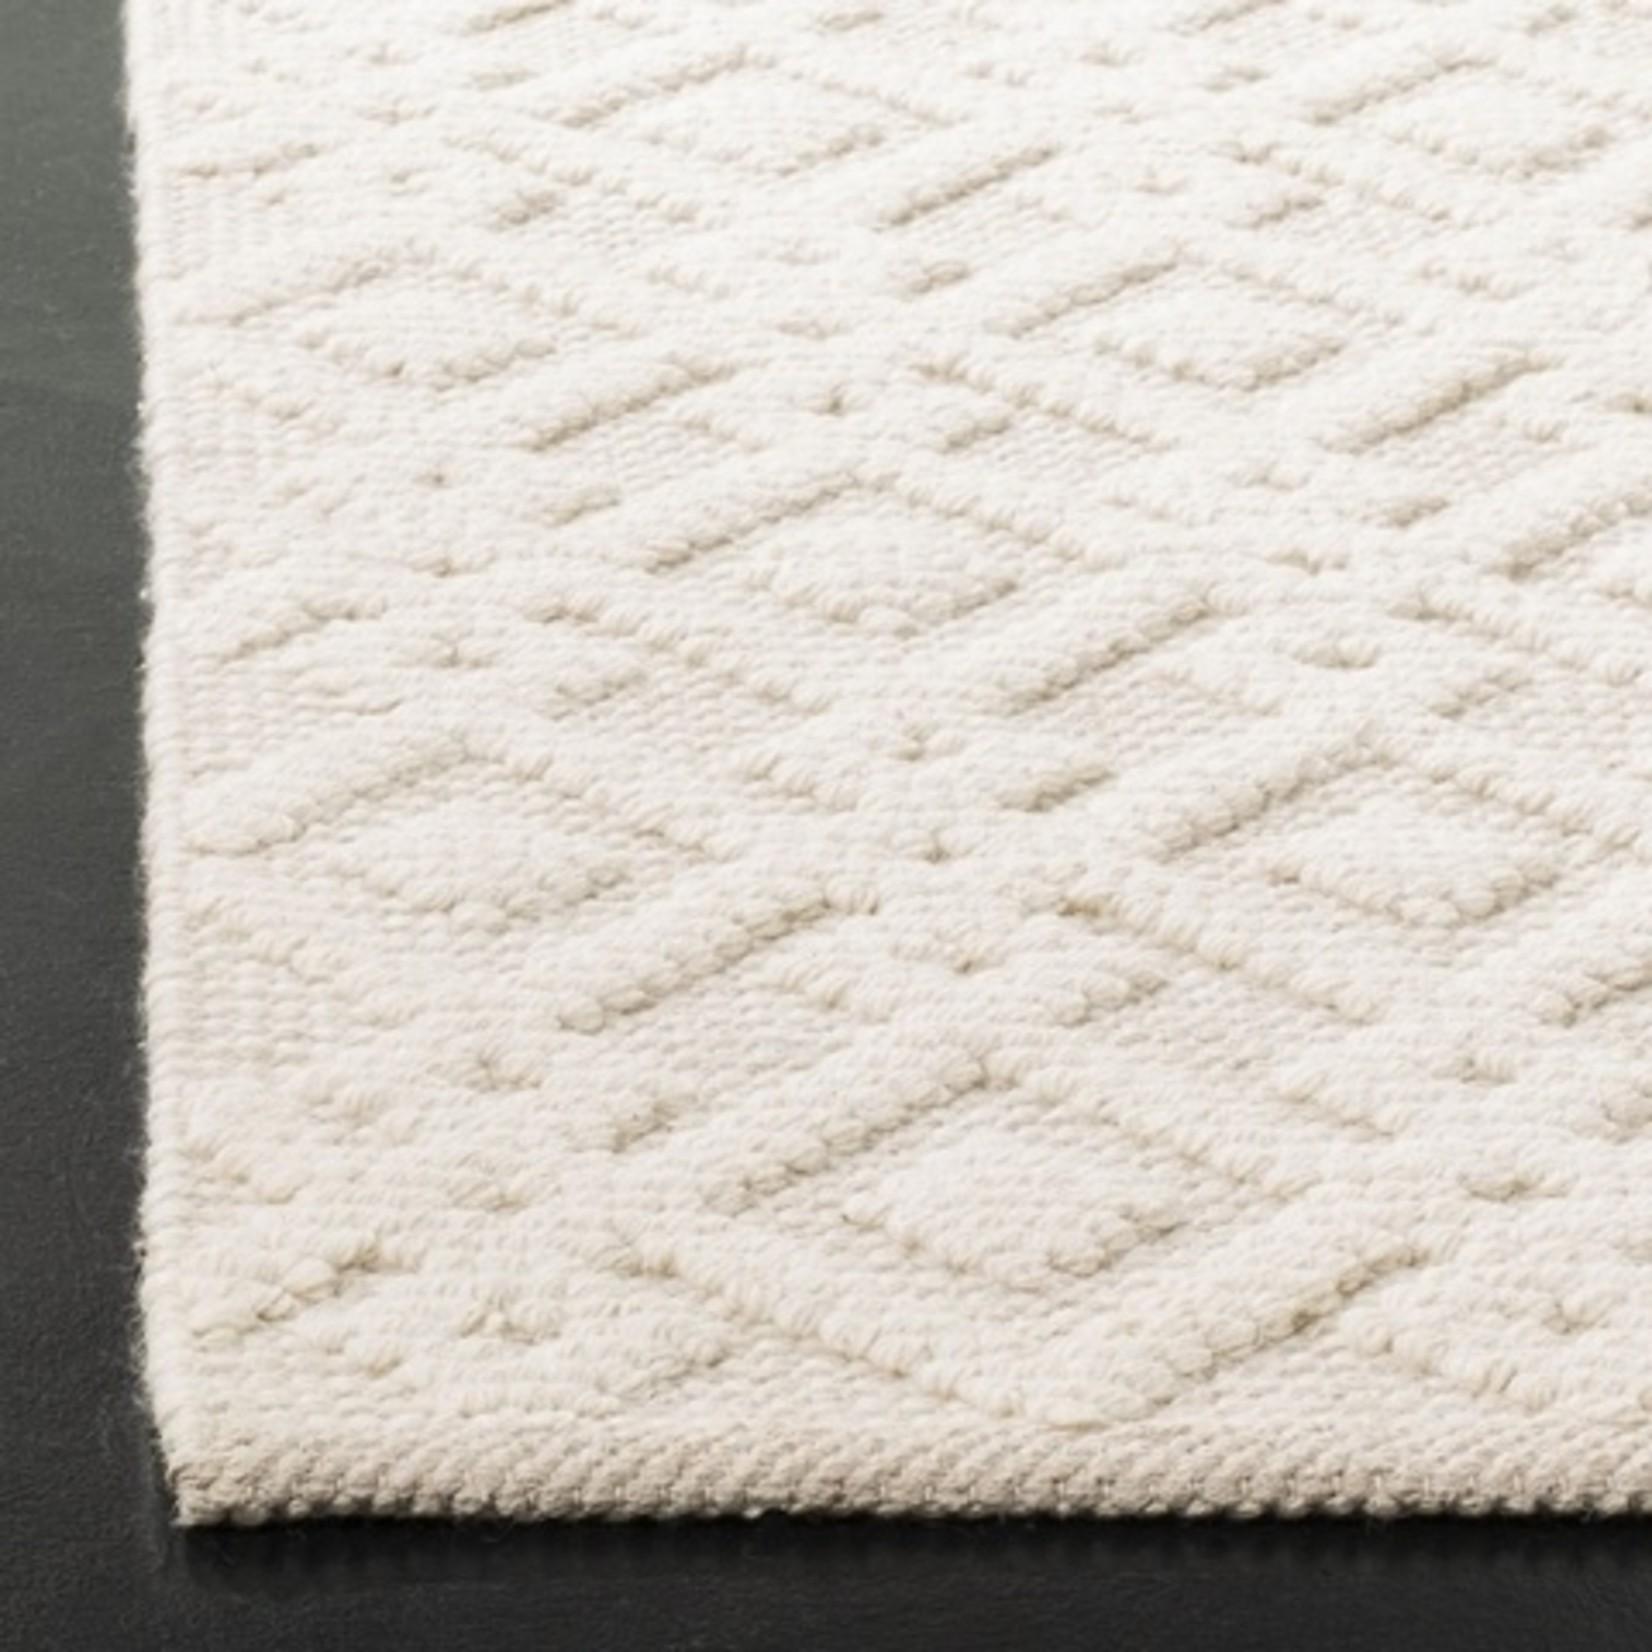 *8' x 10' - Freddy Geometric Handmade Tufted Wool Gray/Ivory Area Rug - Small Tear on Back